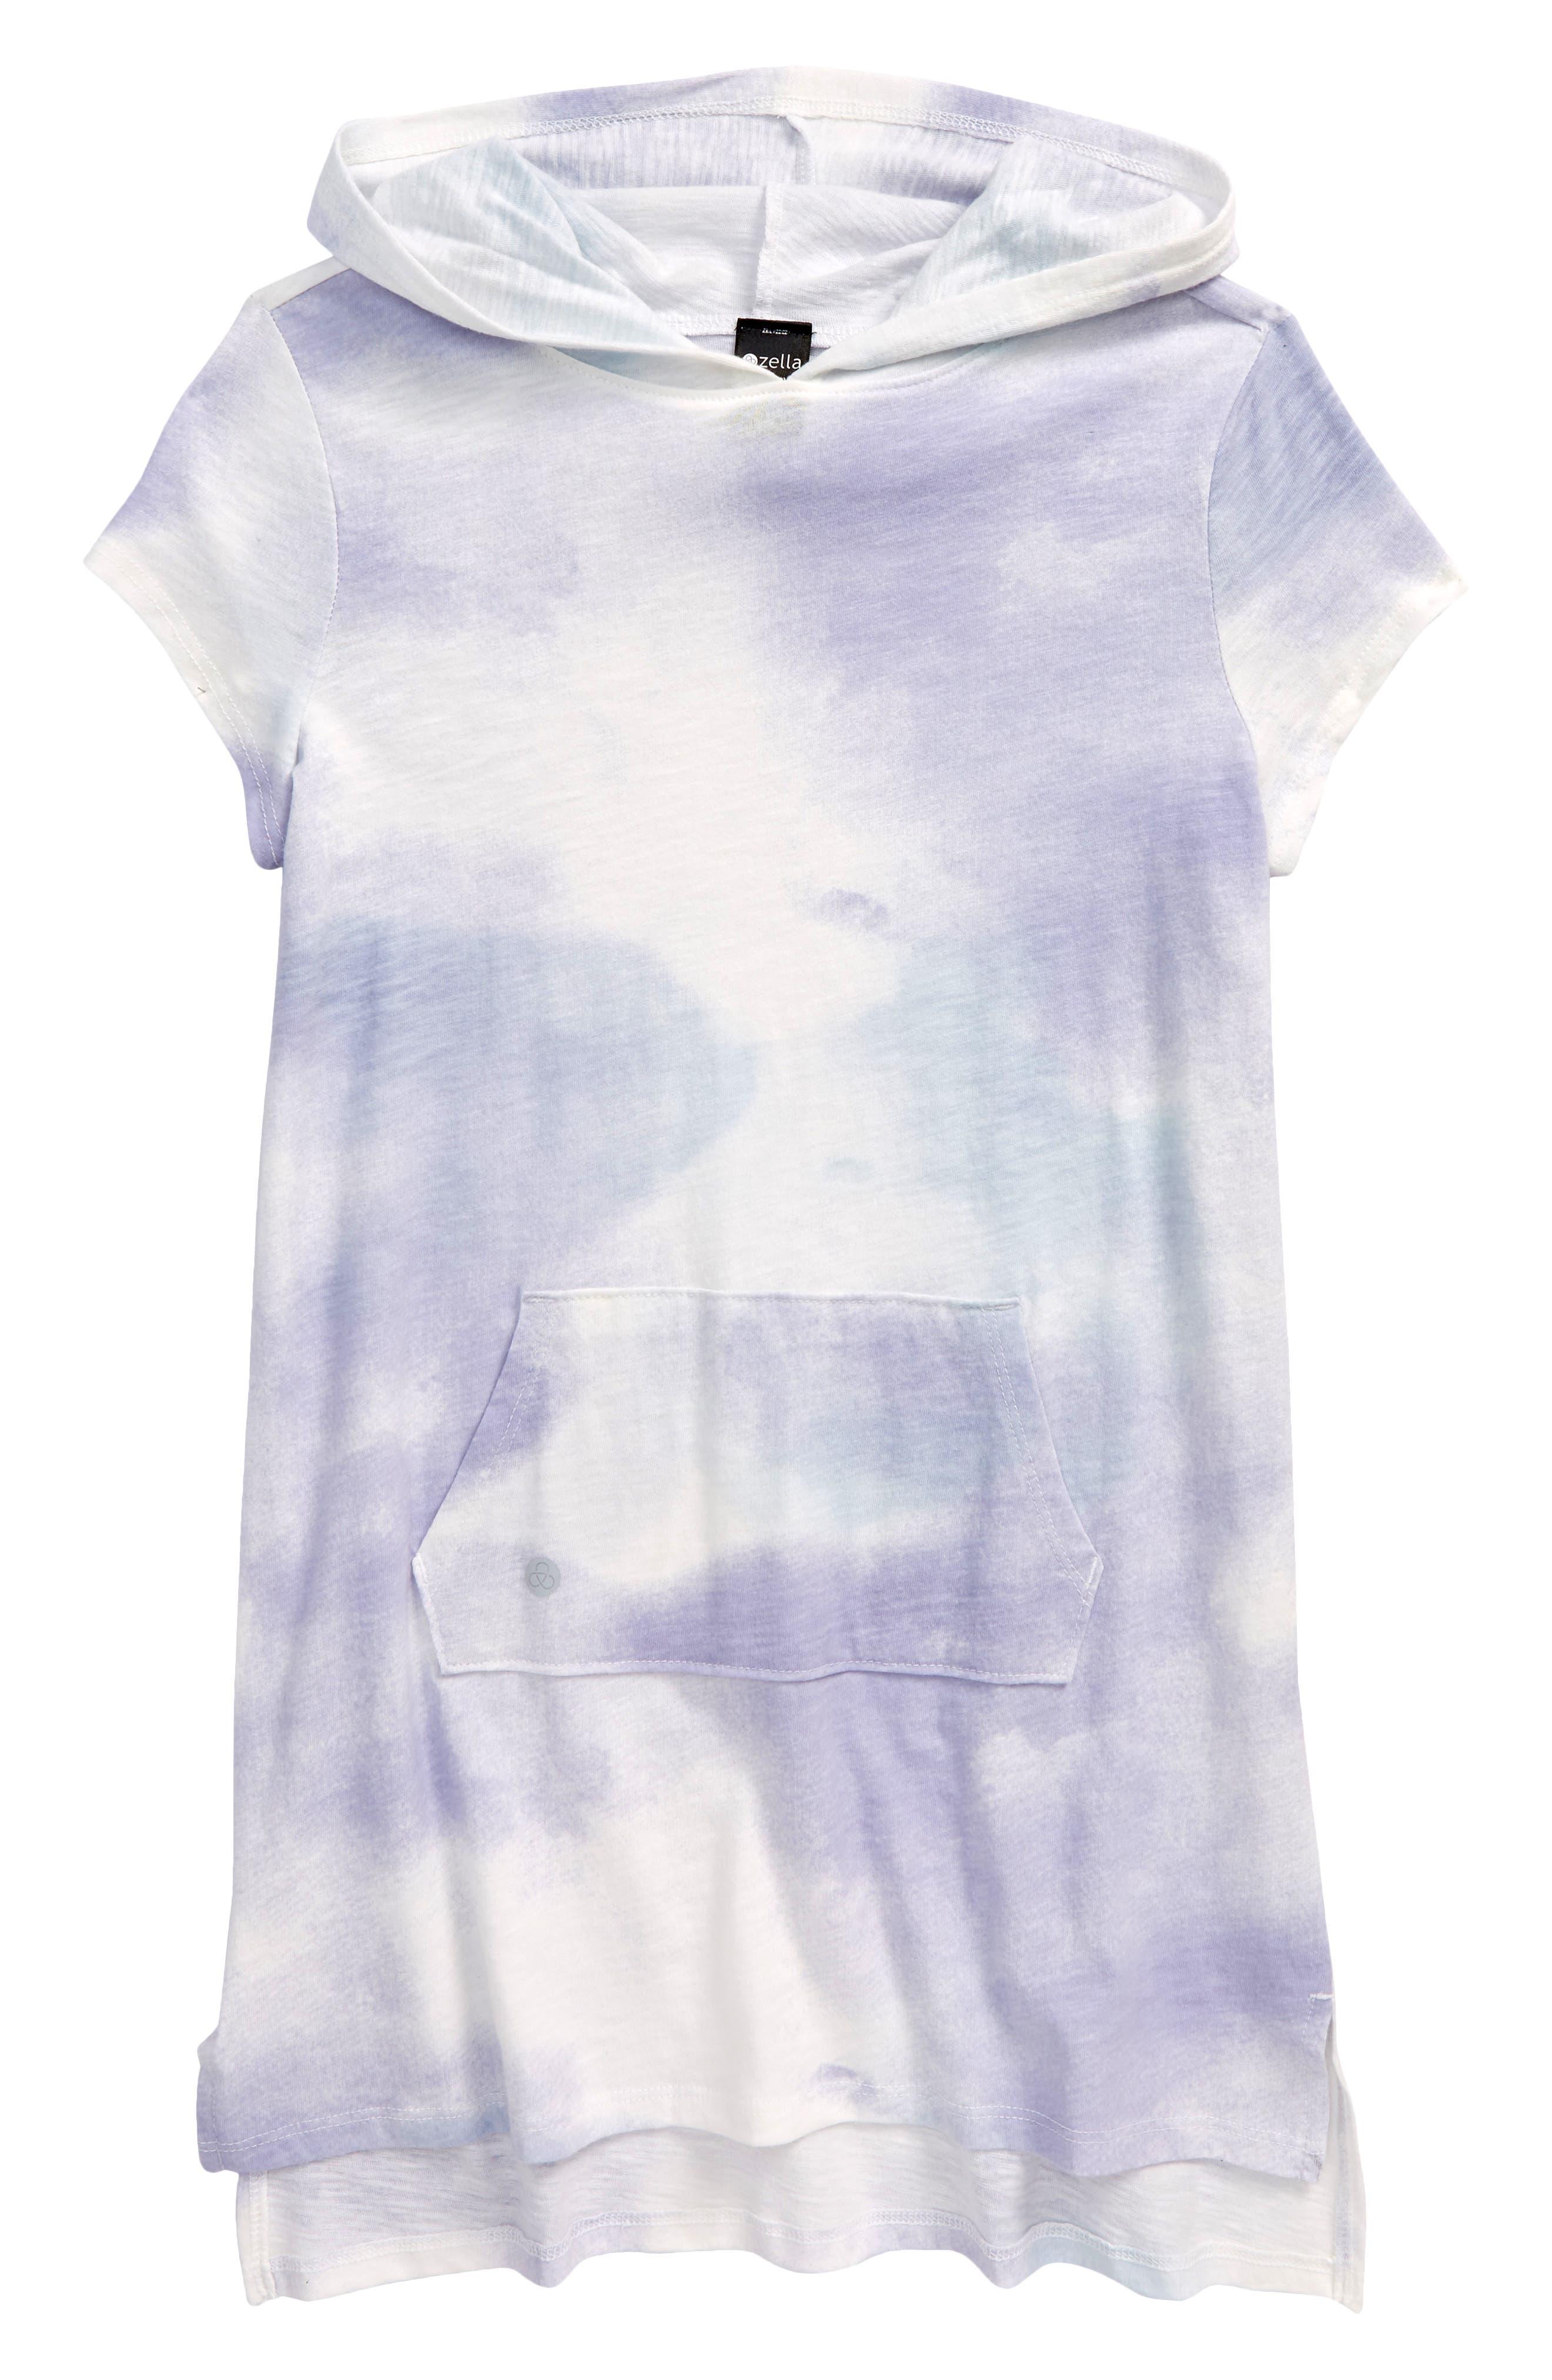 Little Girls Cotton Dress in Designer Fabrics Size 3T